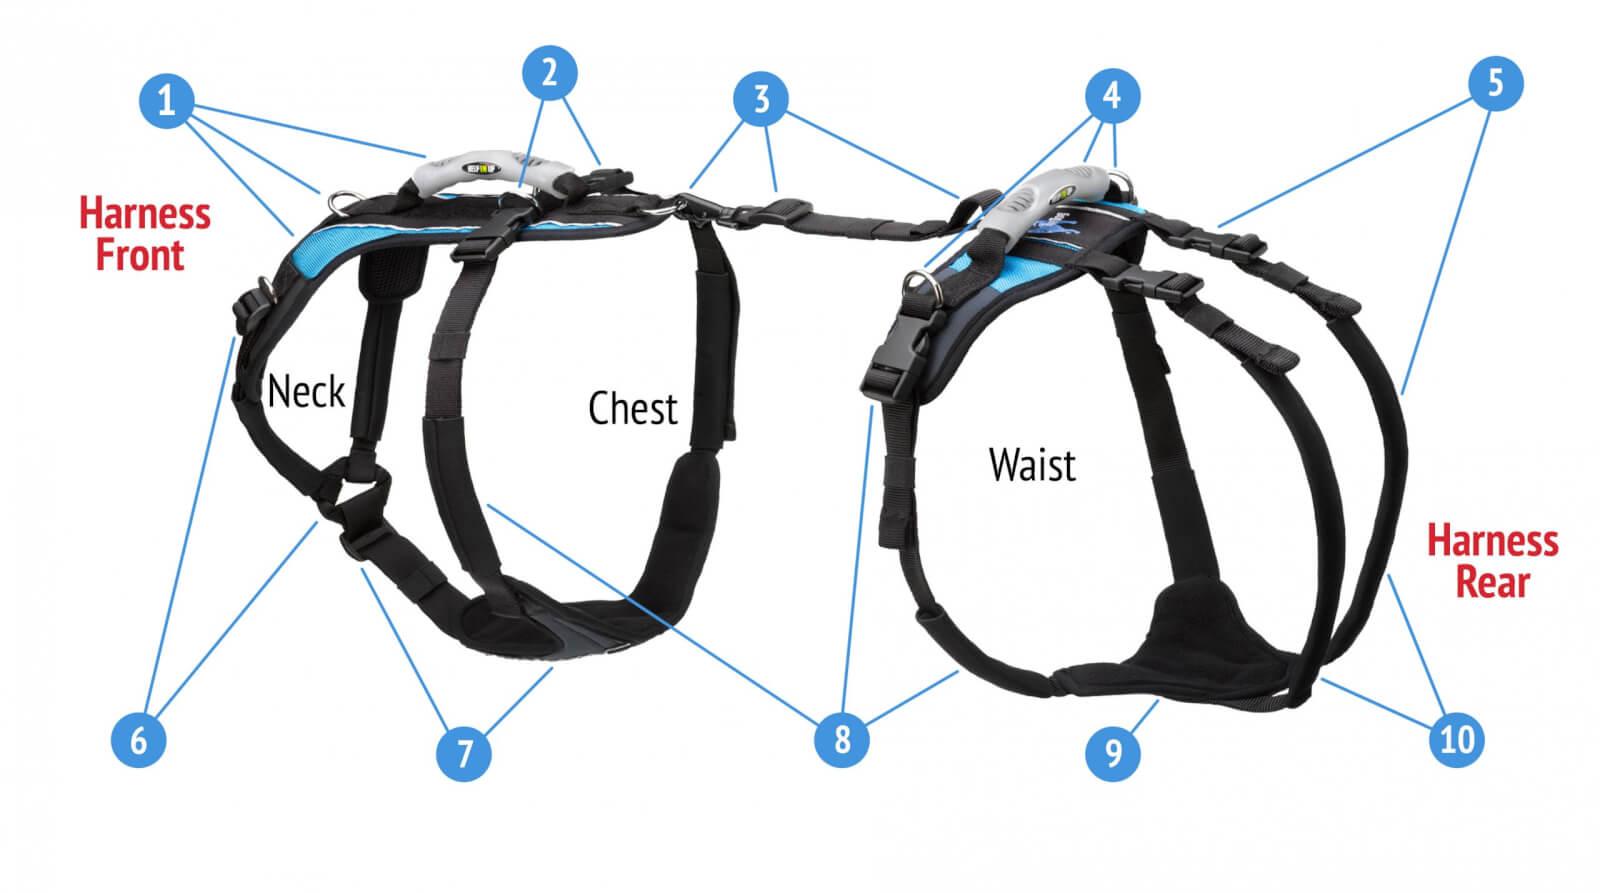 Help 'Em Up Harness Features Diagram